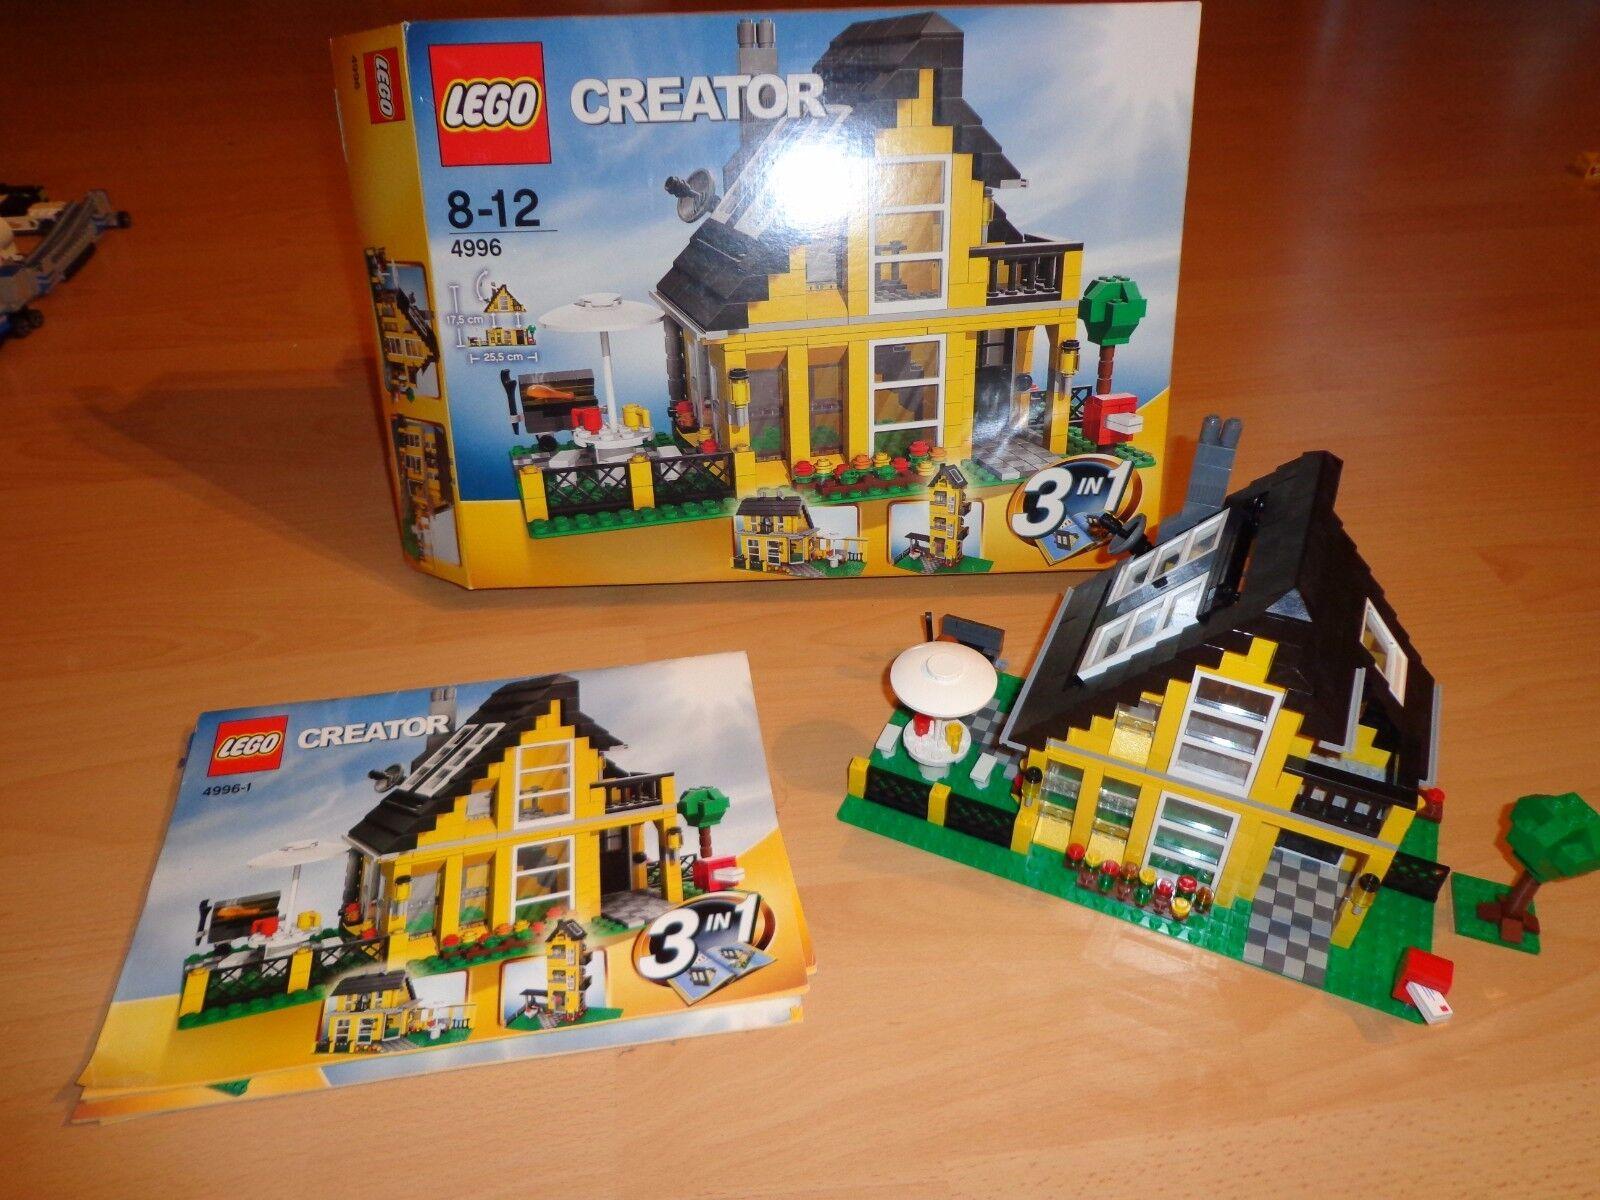 Lego Creator 4996 Ferienhaus OVP mit Bauanleitung komplett